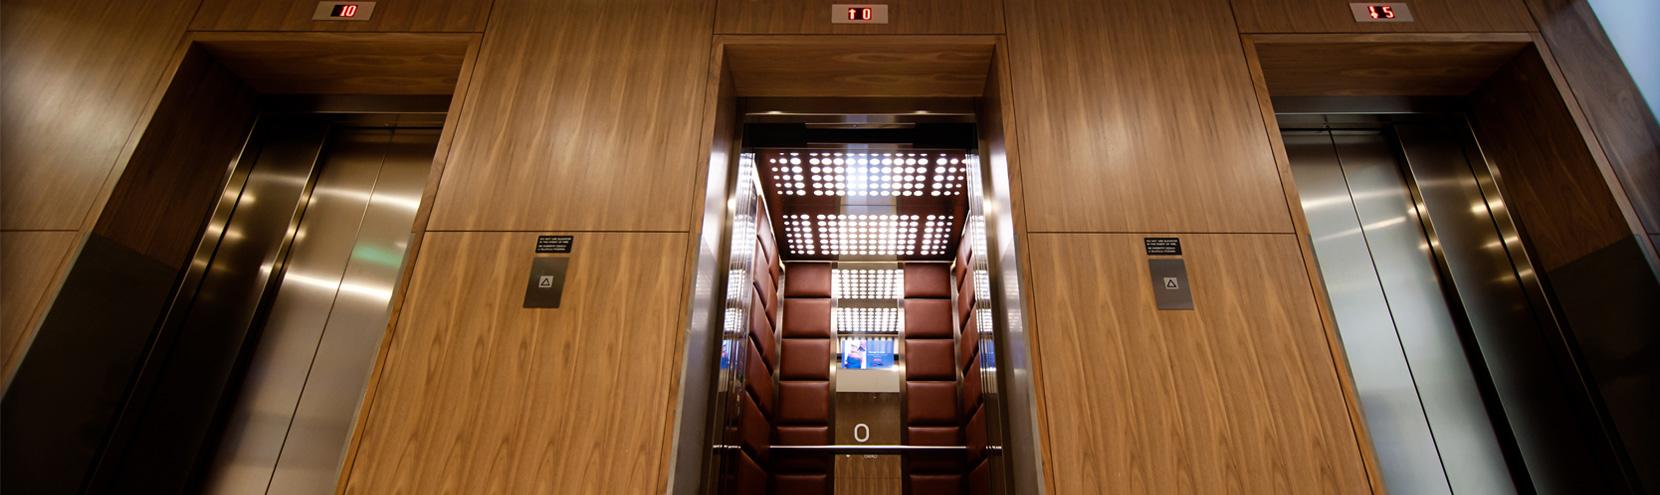 ascenseur maison tunisie